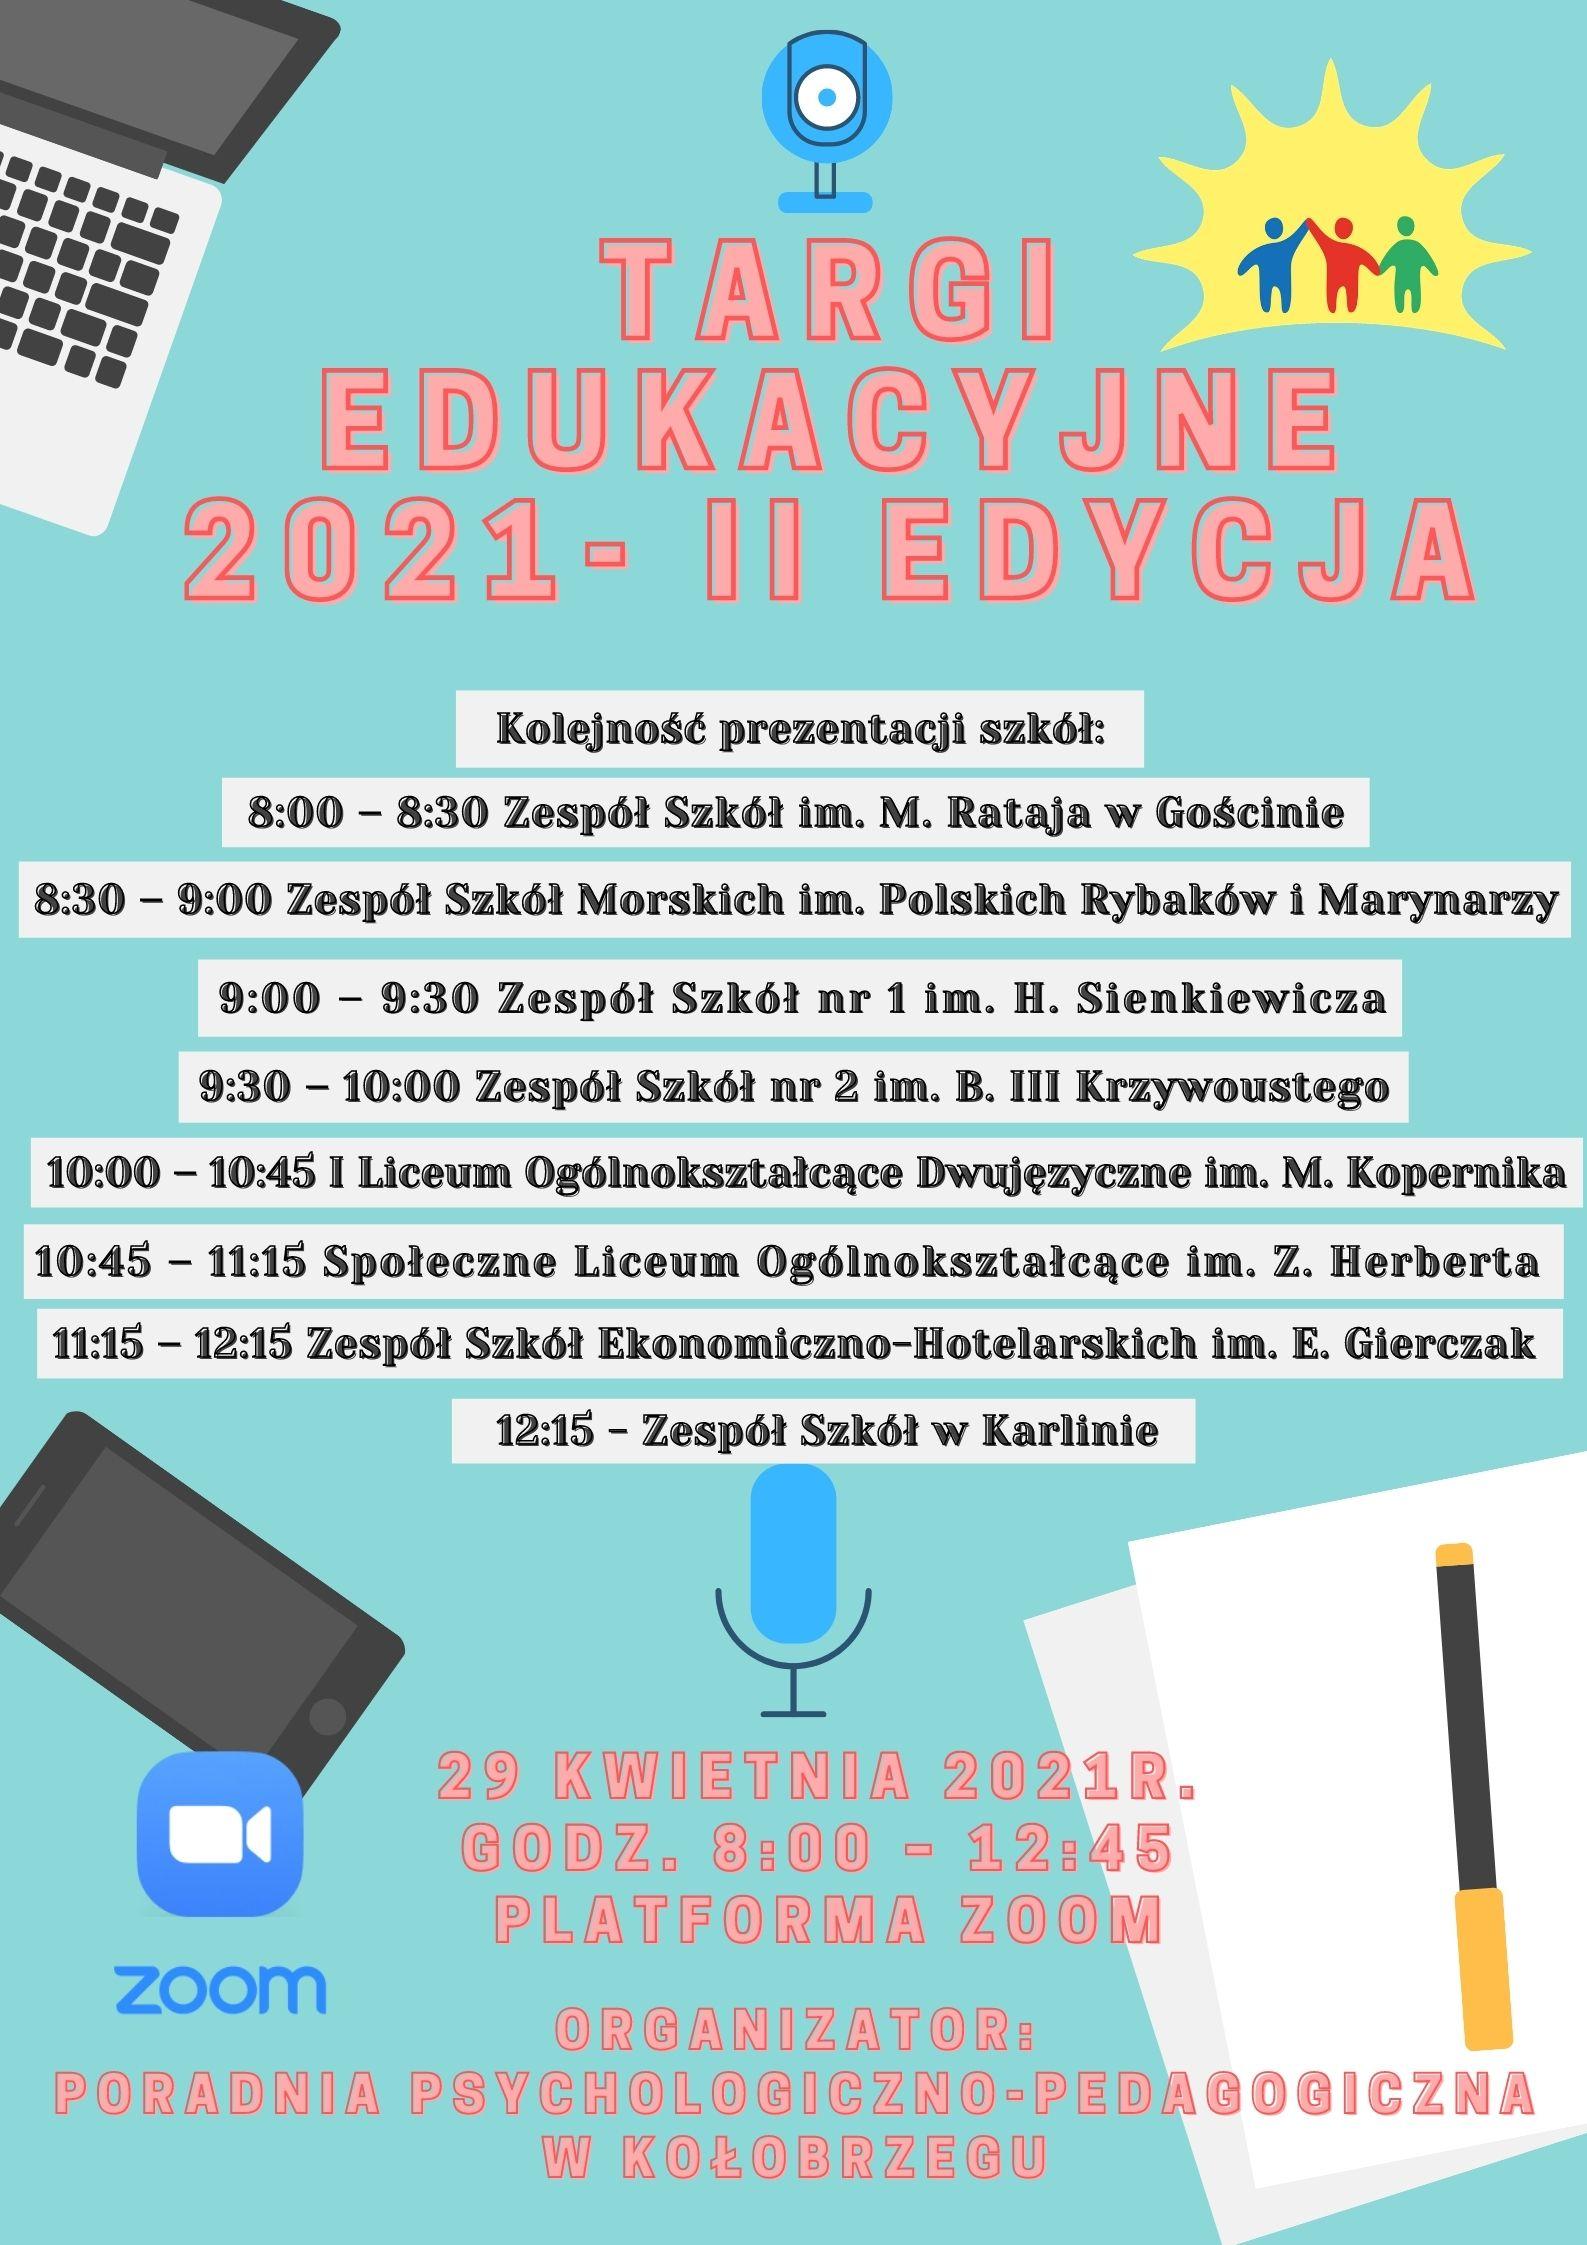 Kopia Targi edukacyjne 2021 II edycja